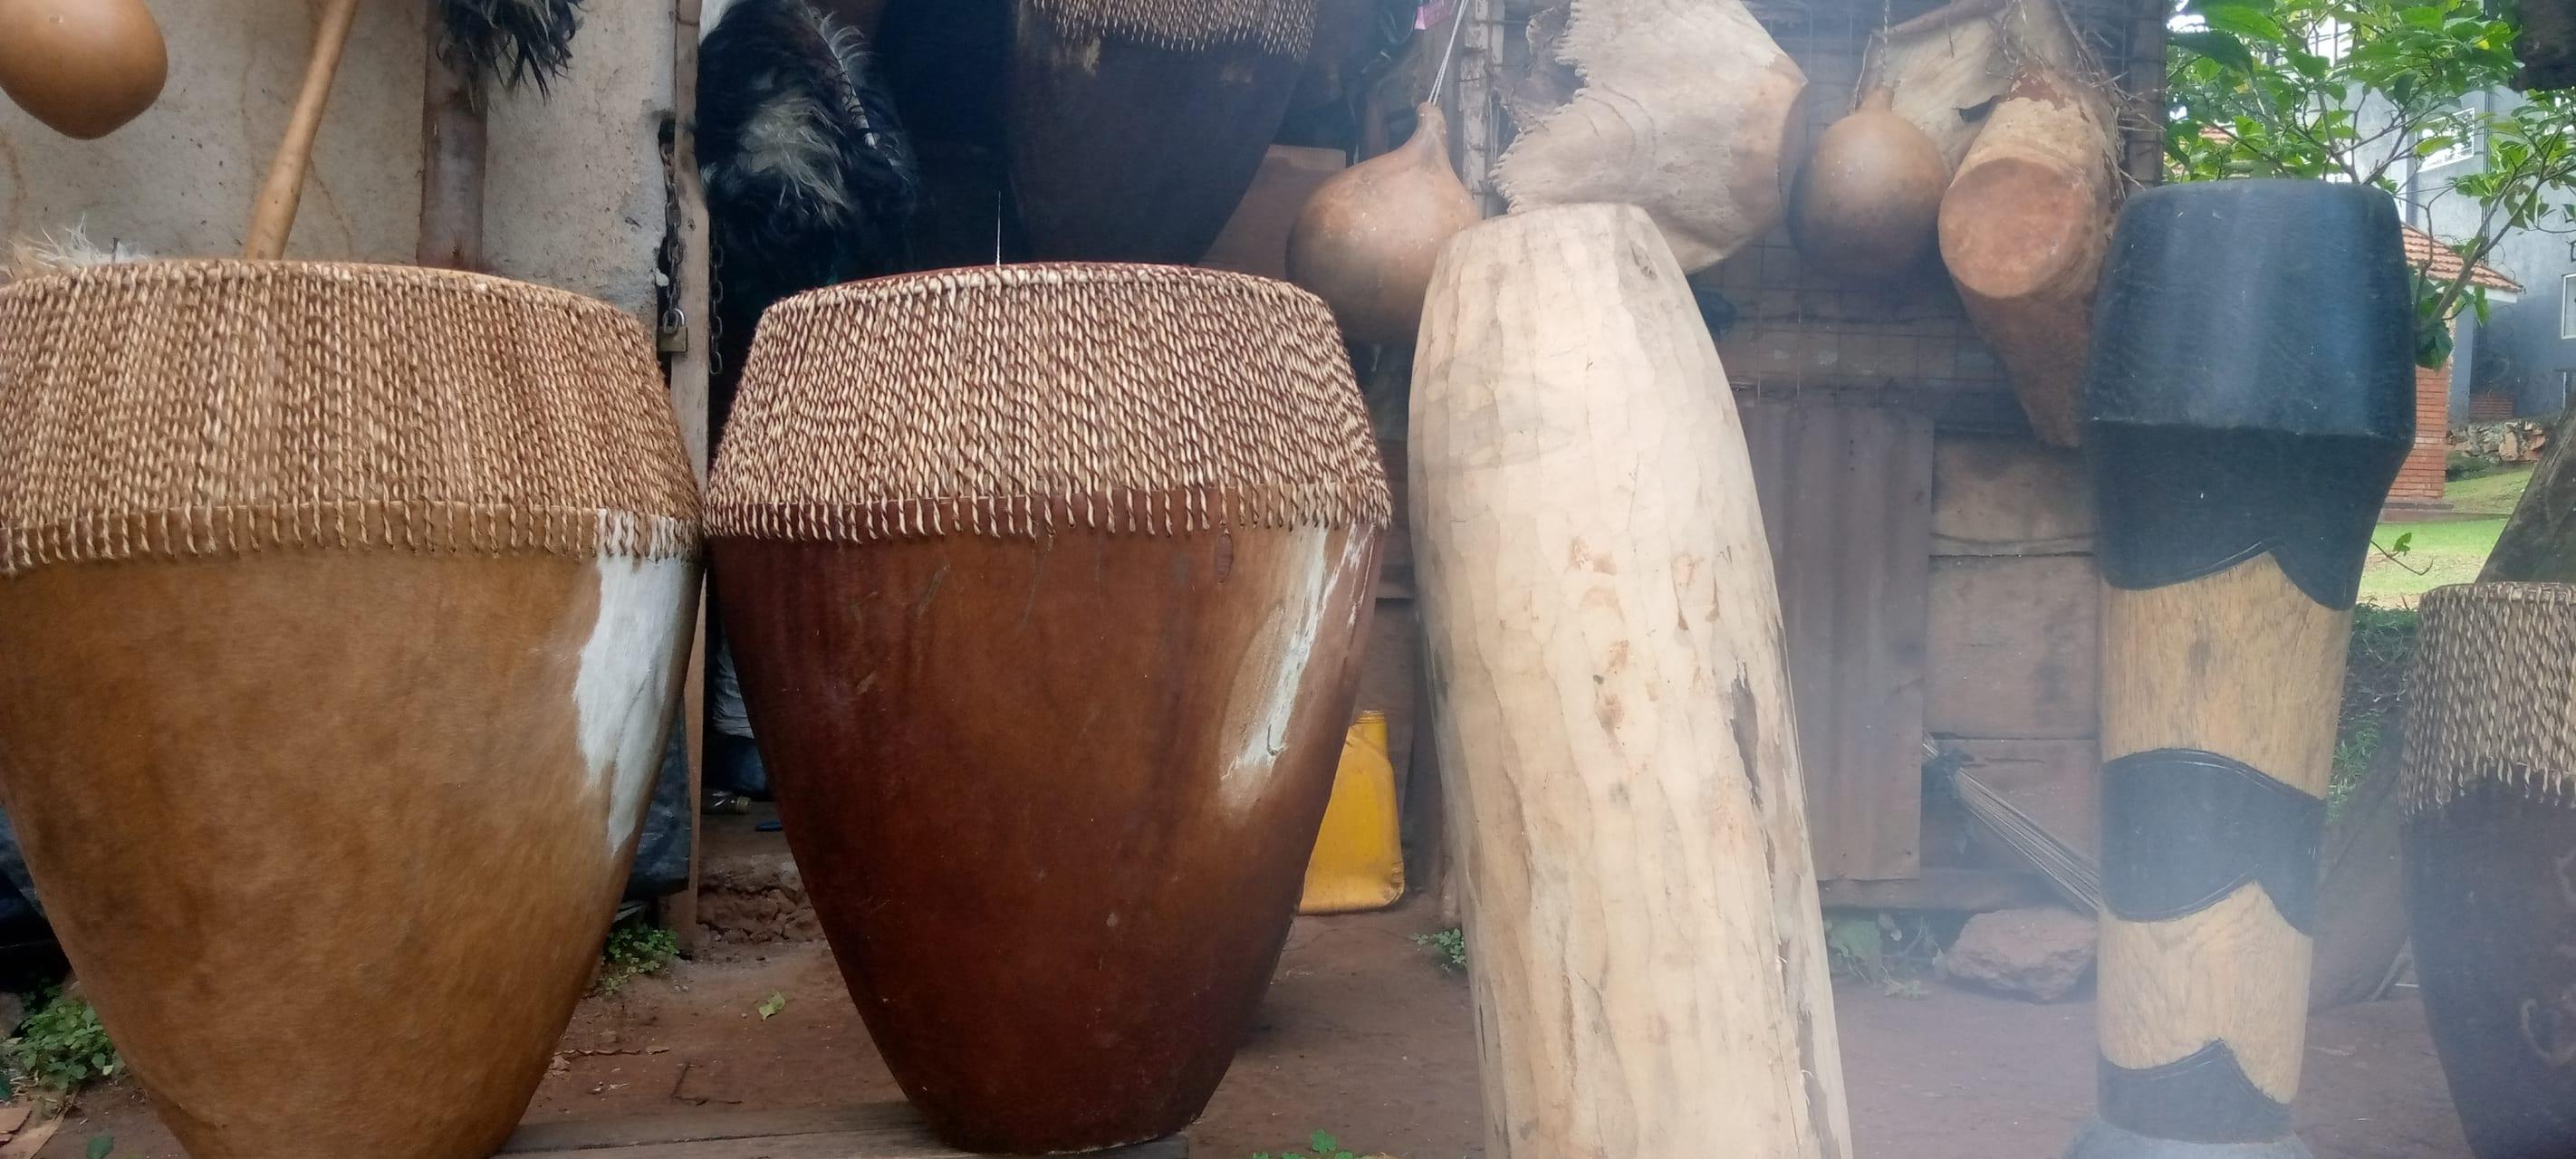 Kampala - Culture I: It's Drums, Sounds & Footwork